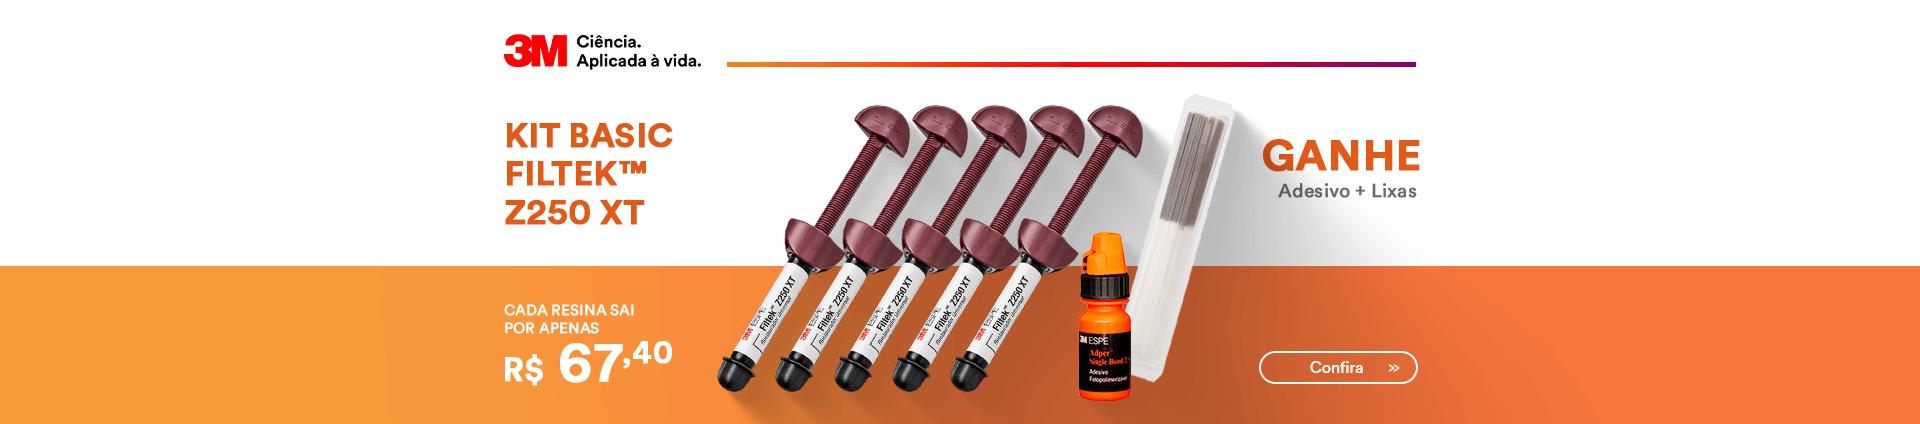 Compre Kit Resina Z250XT e Ganhe Adesivo Single Bond 3M | Dental Cremer